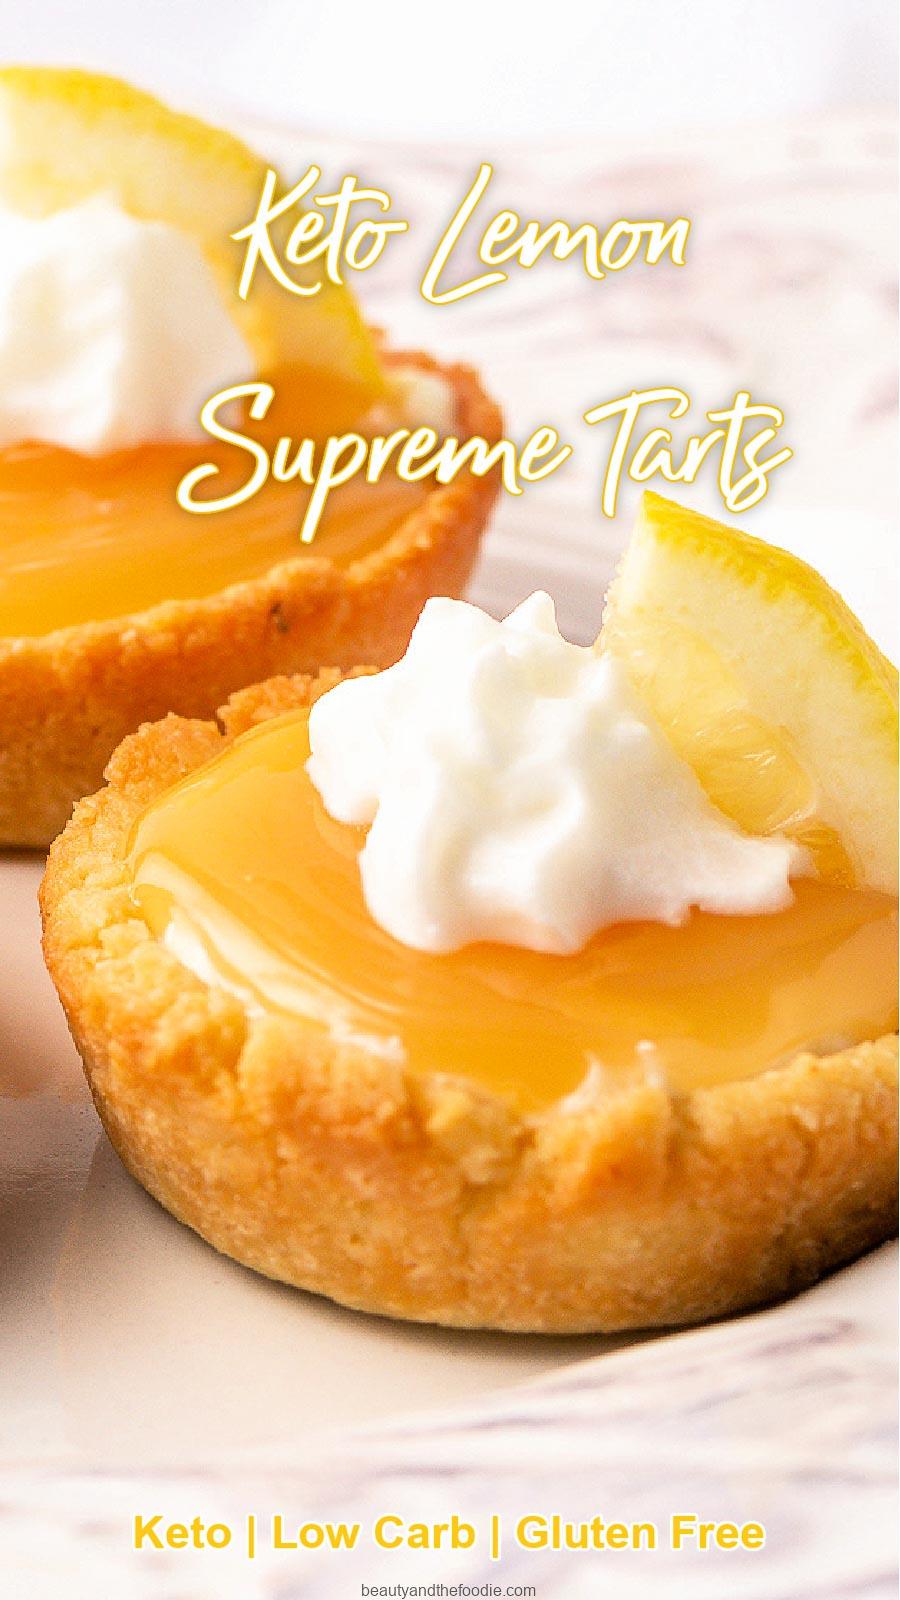 Two sugar free lemon mini tarts with cream